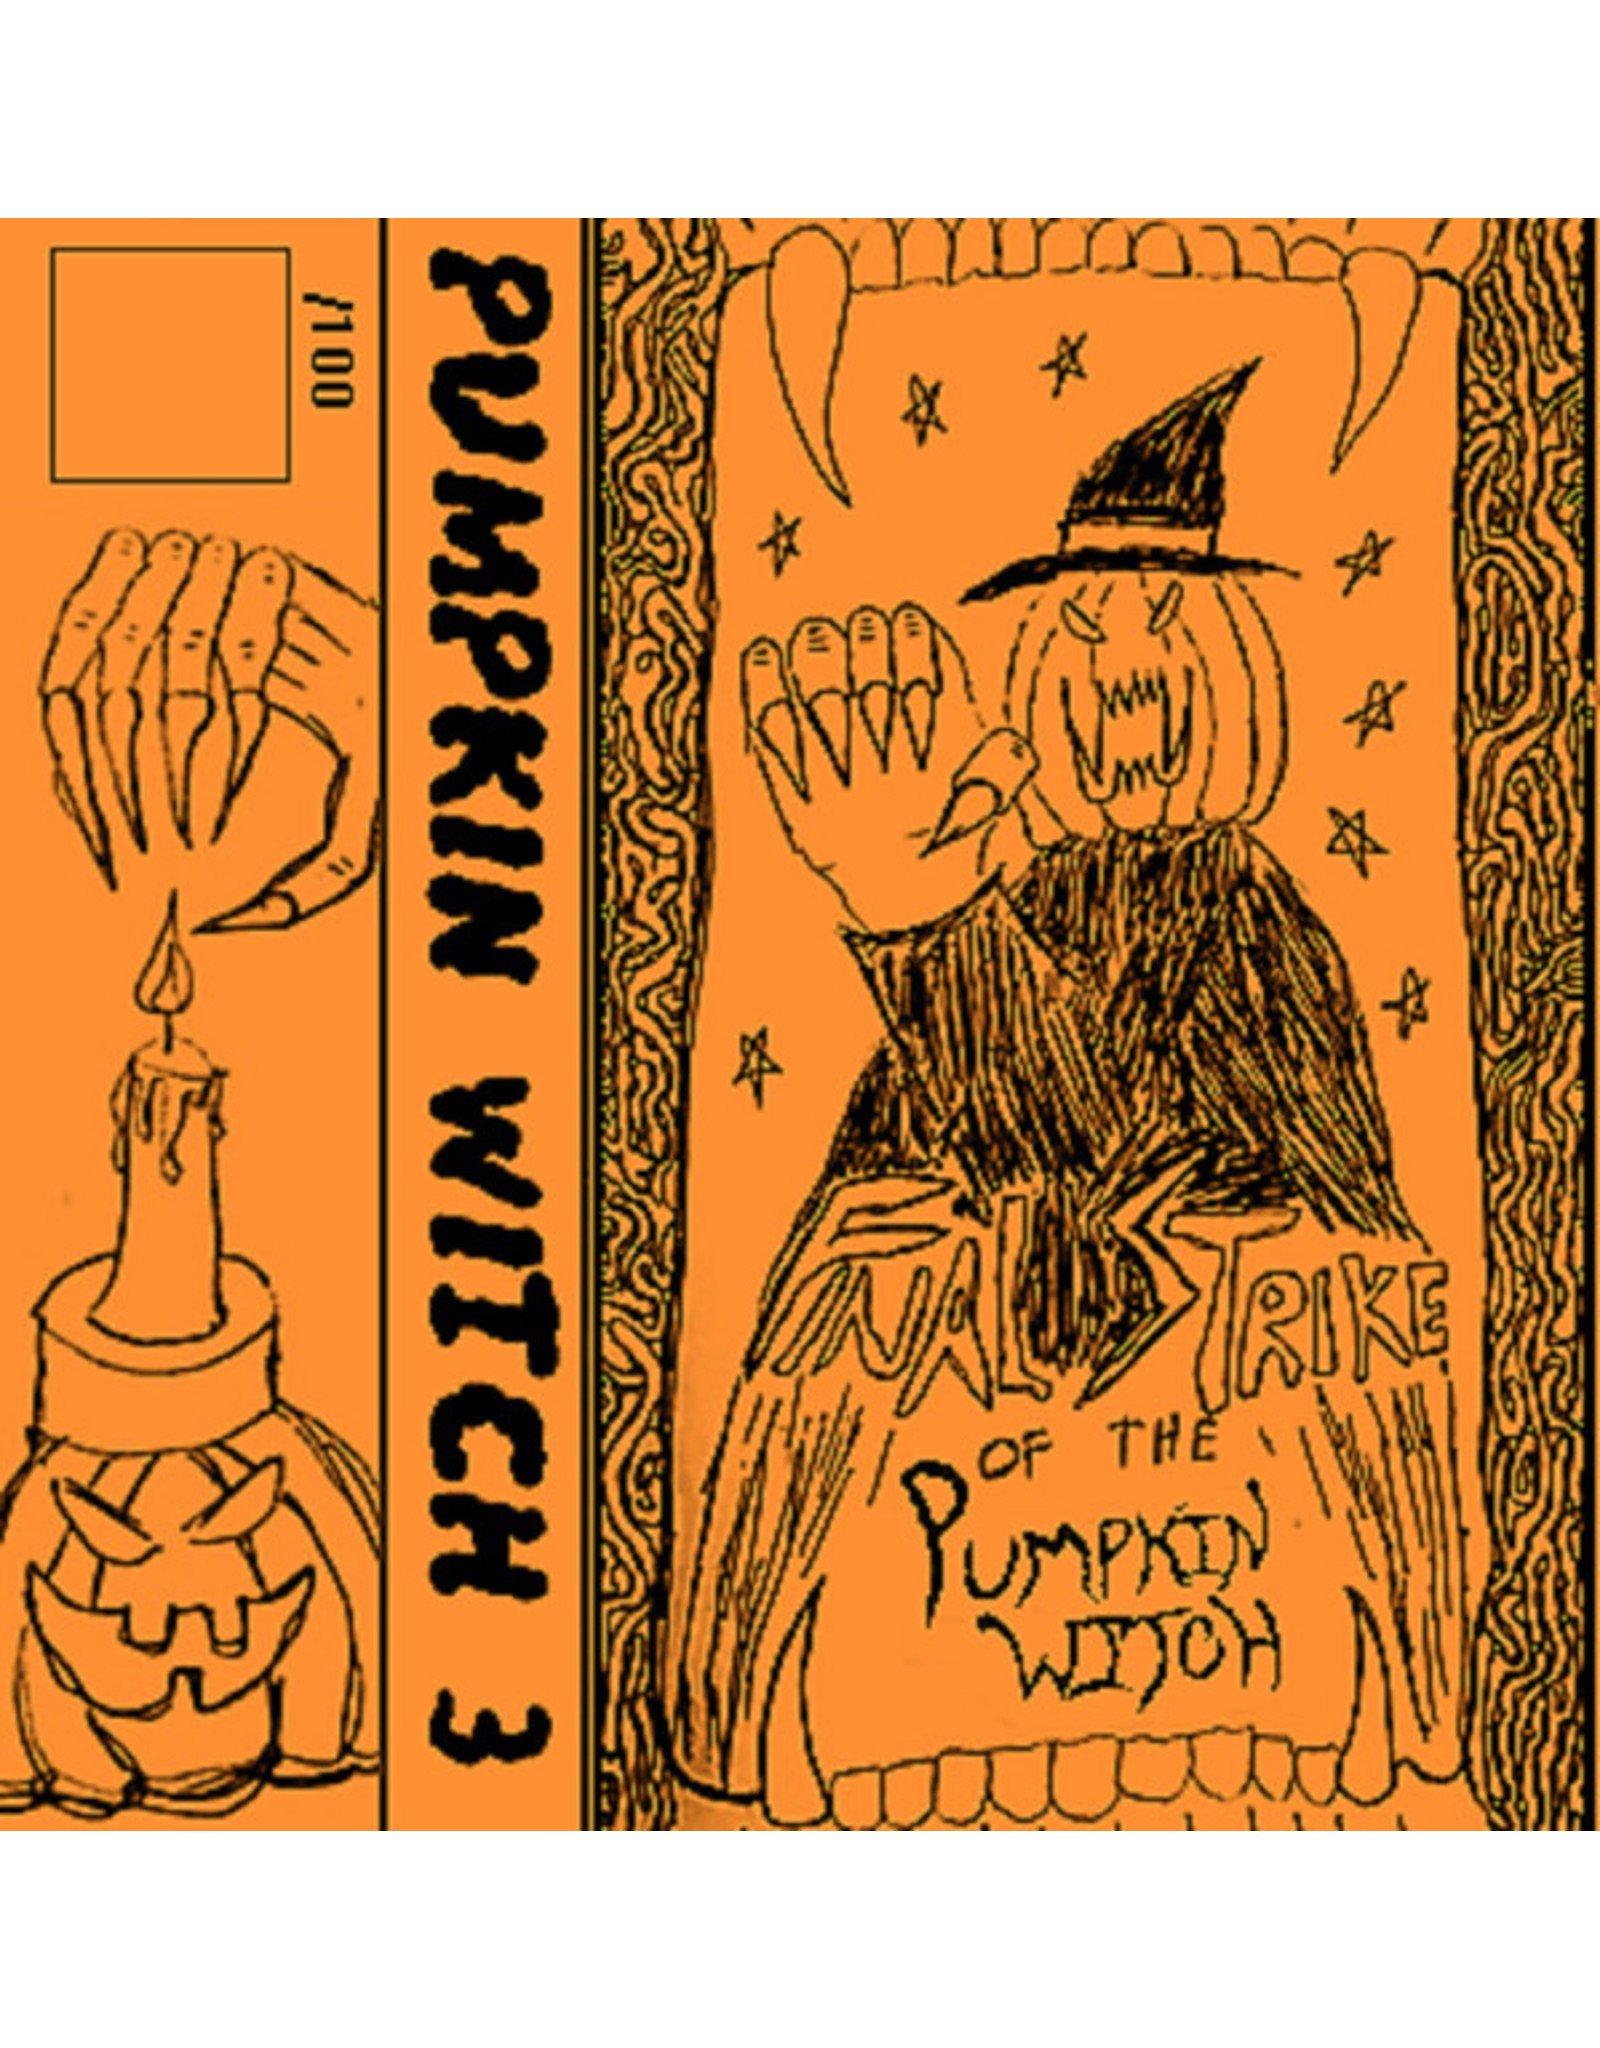 New Vinyl Pumpkin Witch - Final Strike Of The Pumpkin Witch 2LP